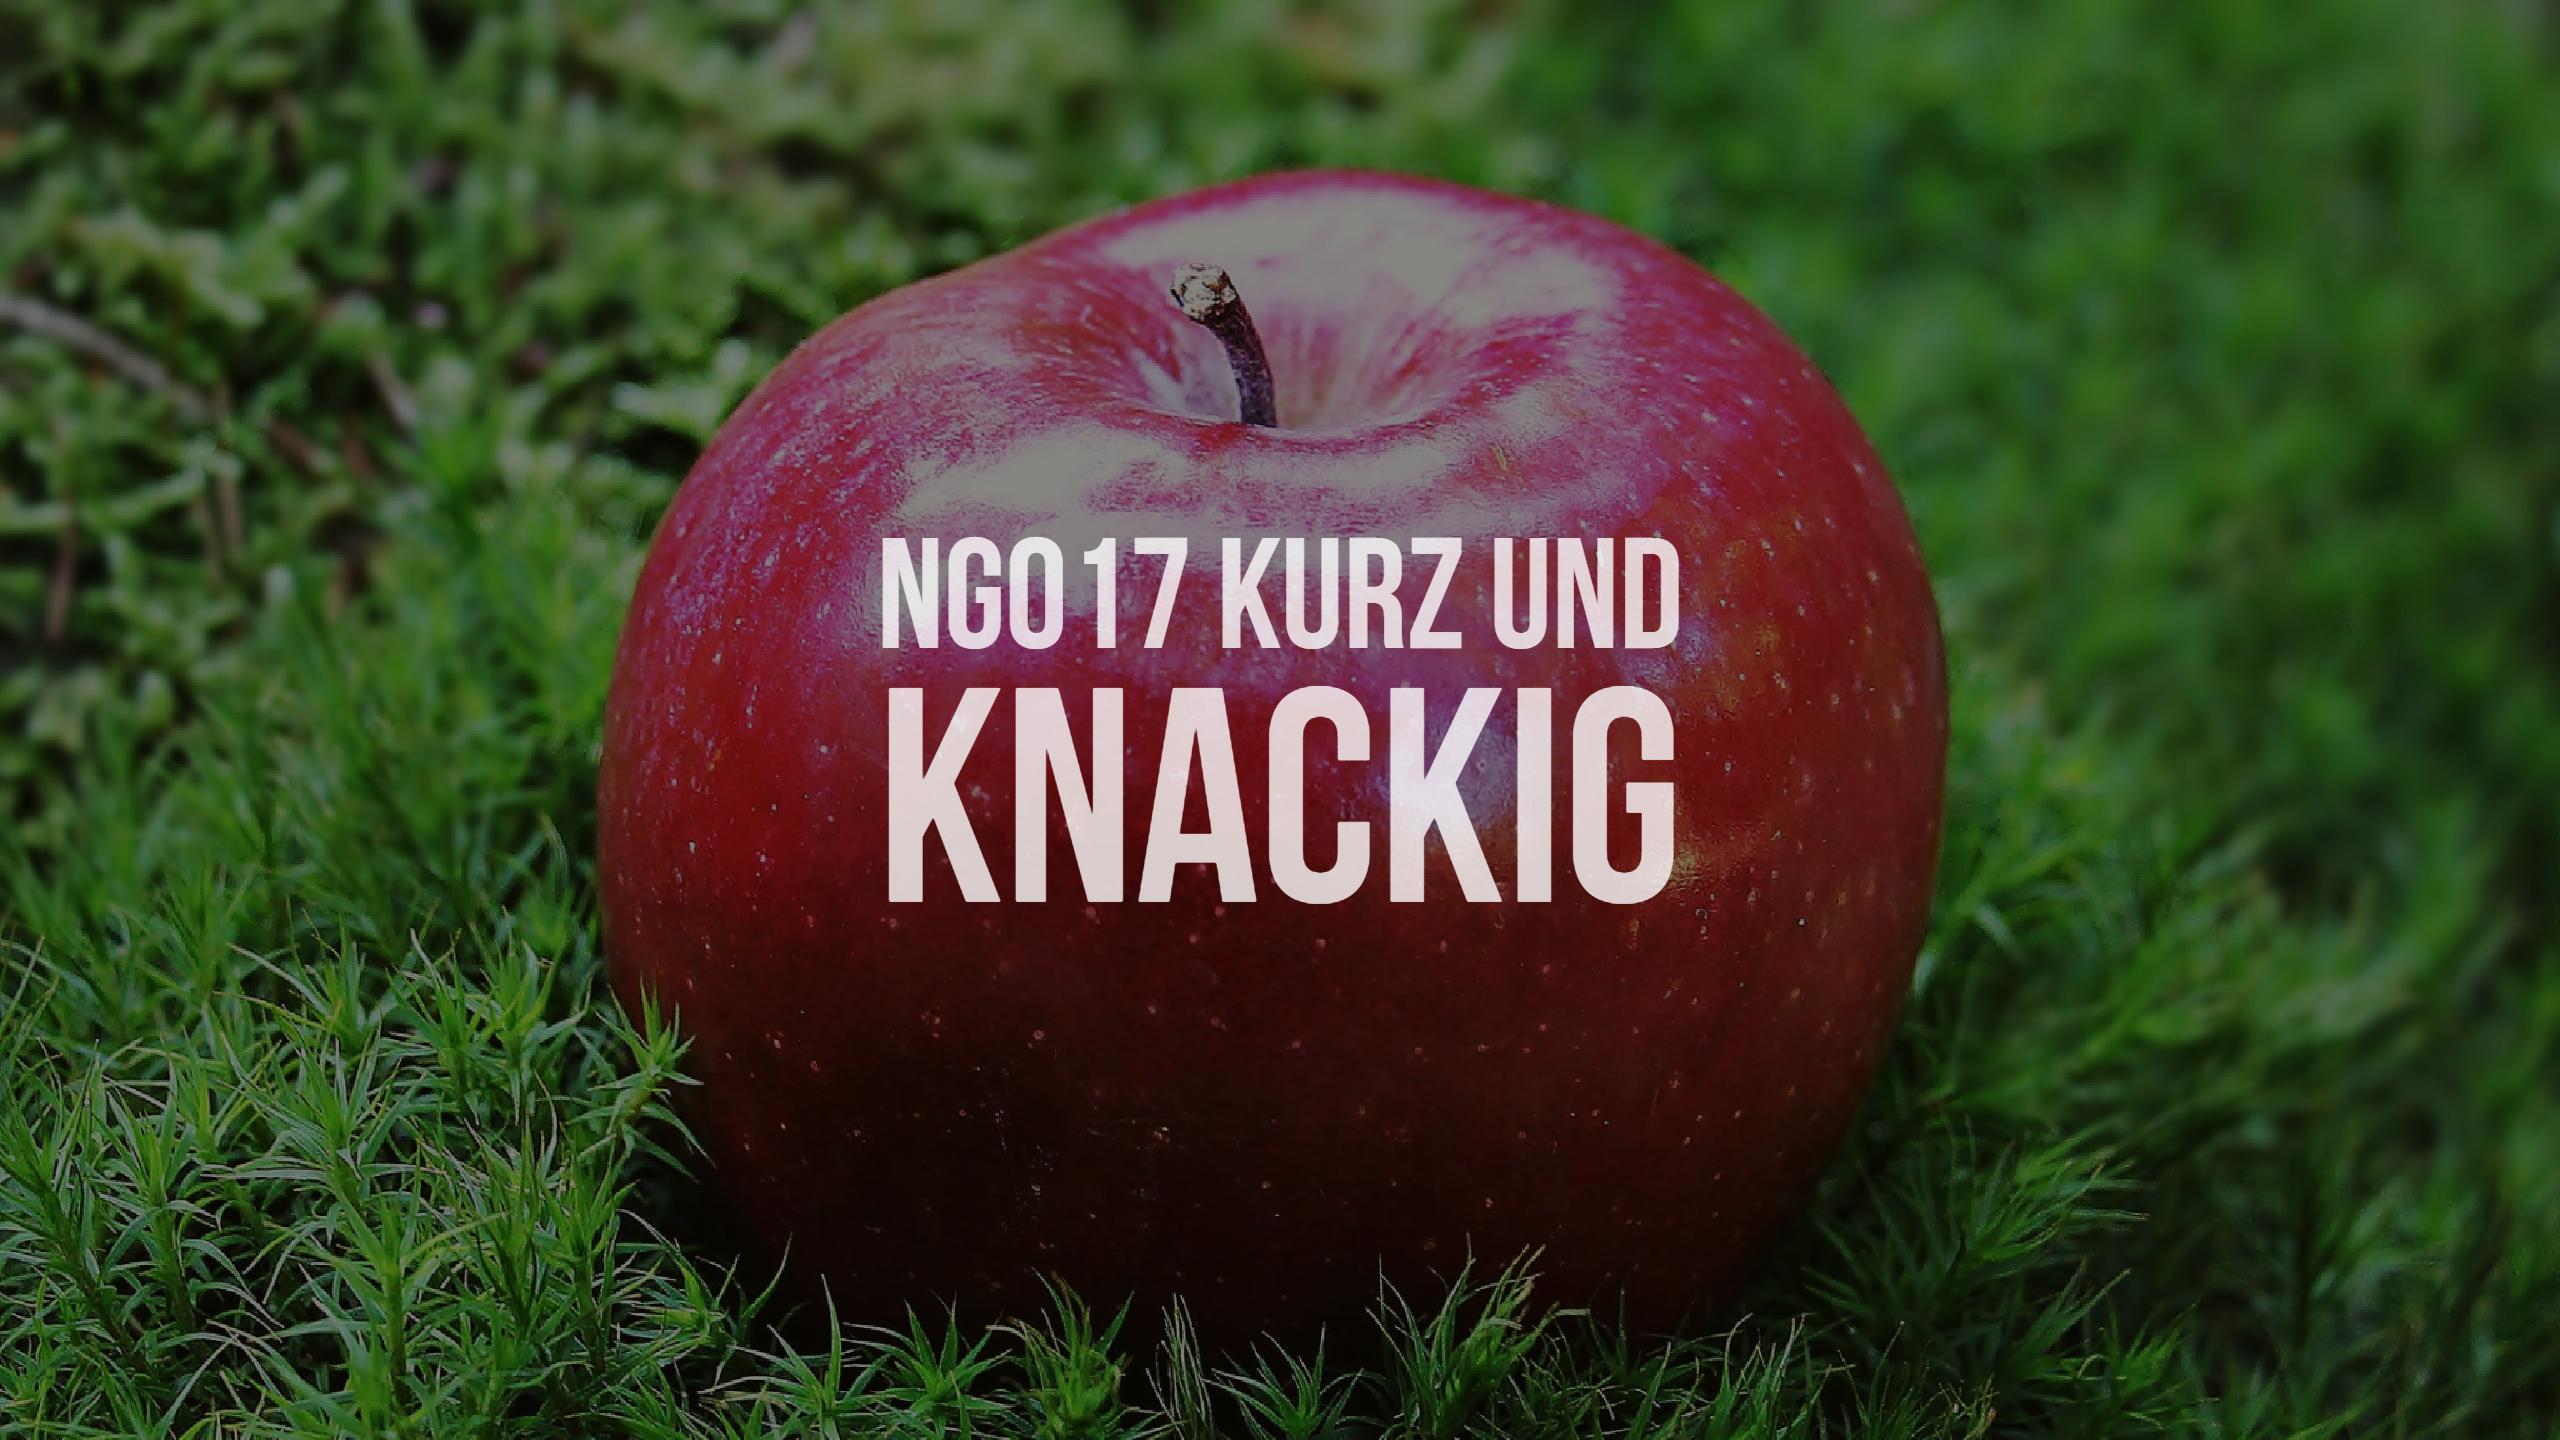 NG017 kurz und knackig